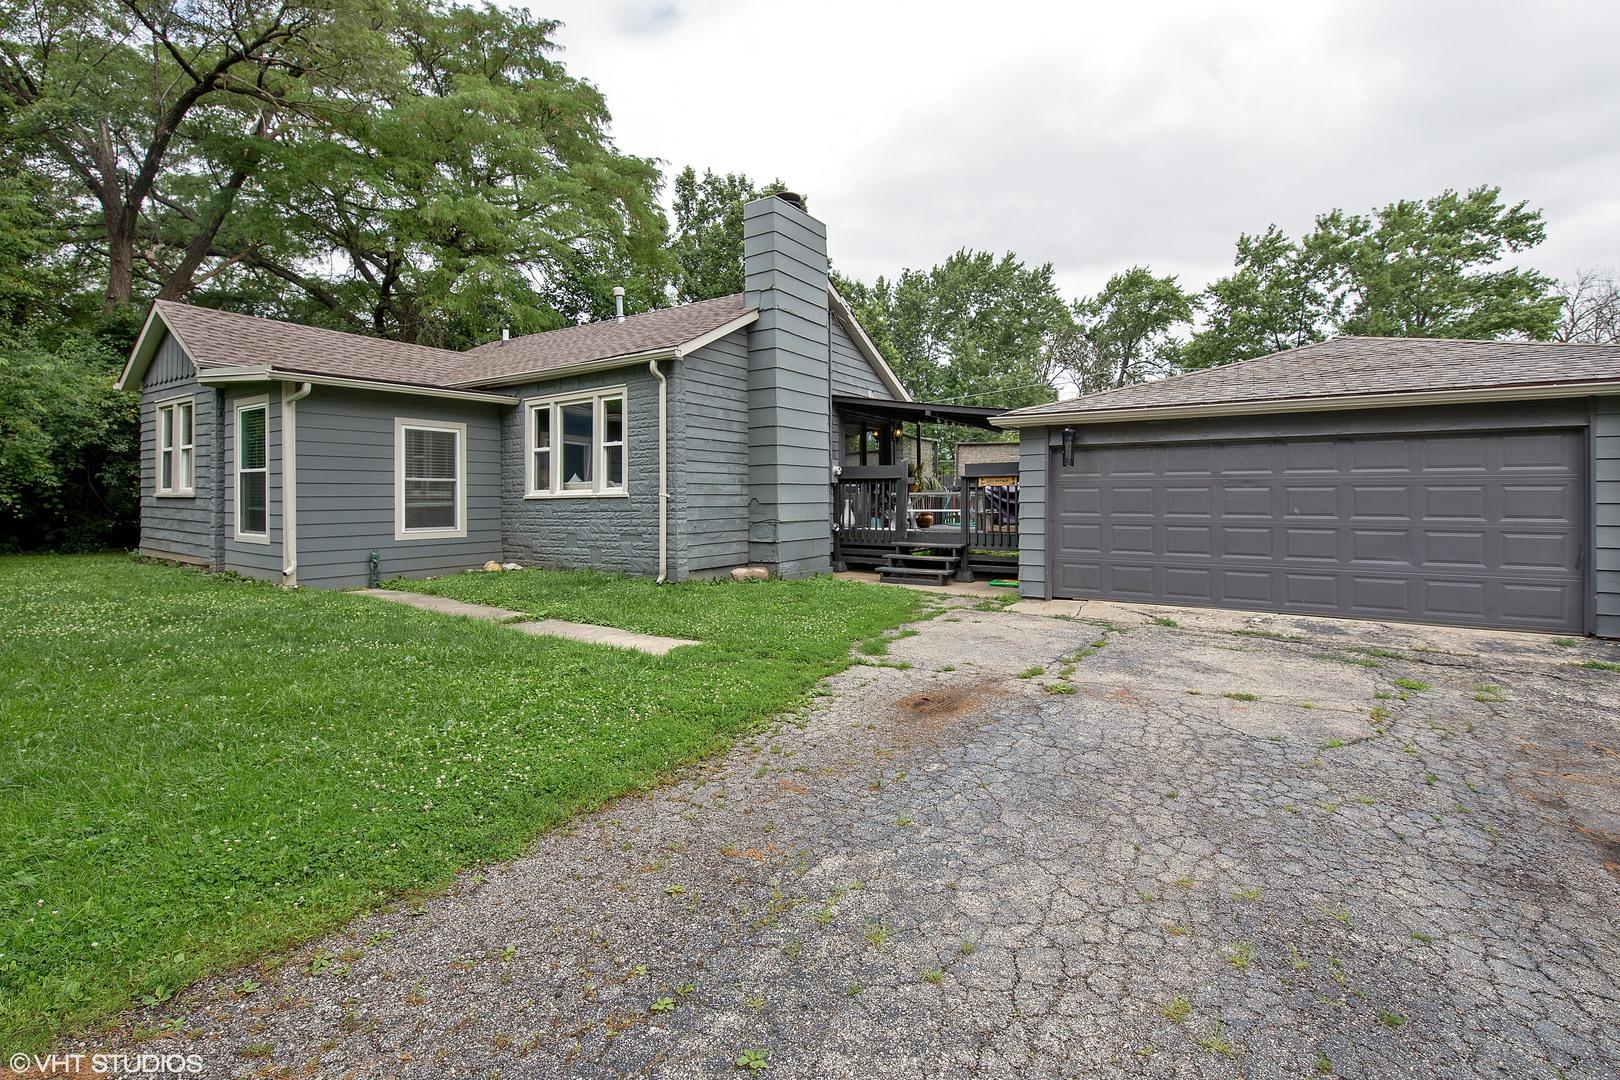 17W330 White Pine Rd, Bensenville IL 60106